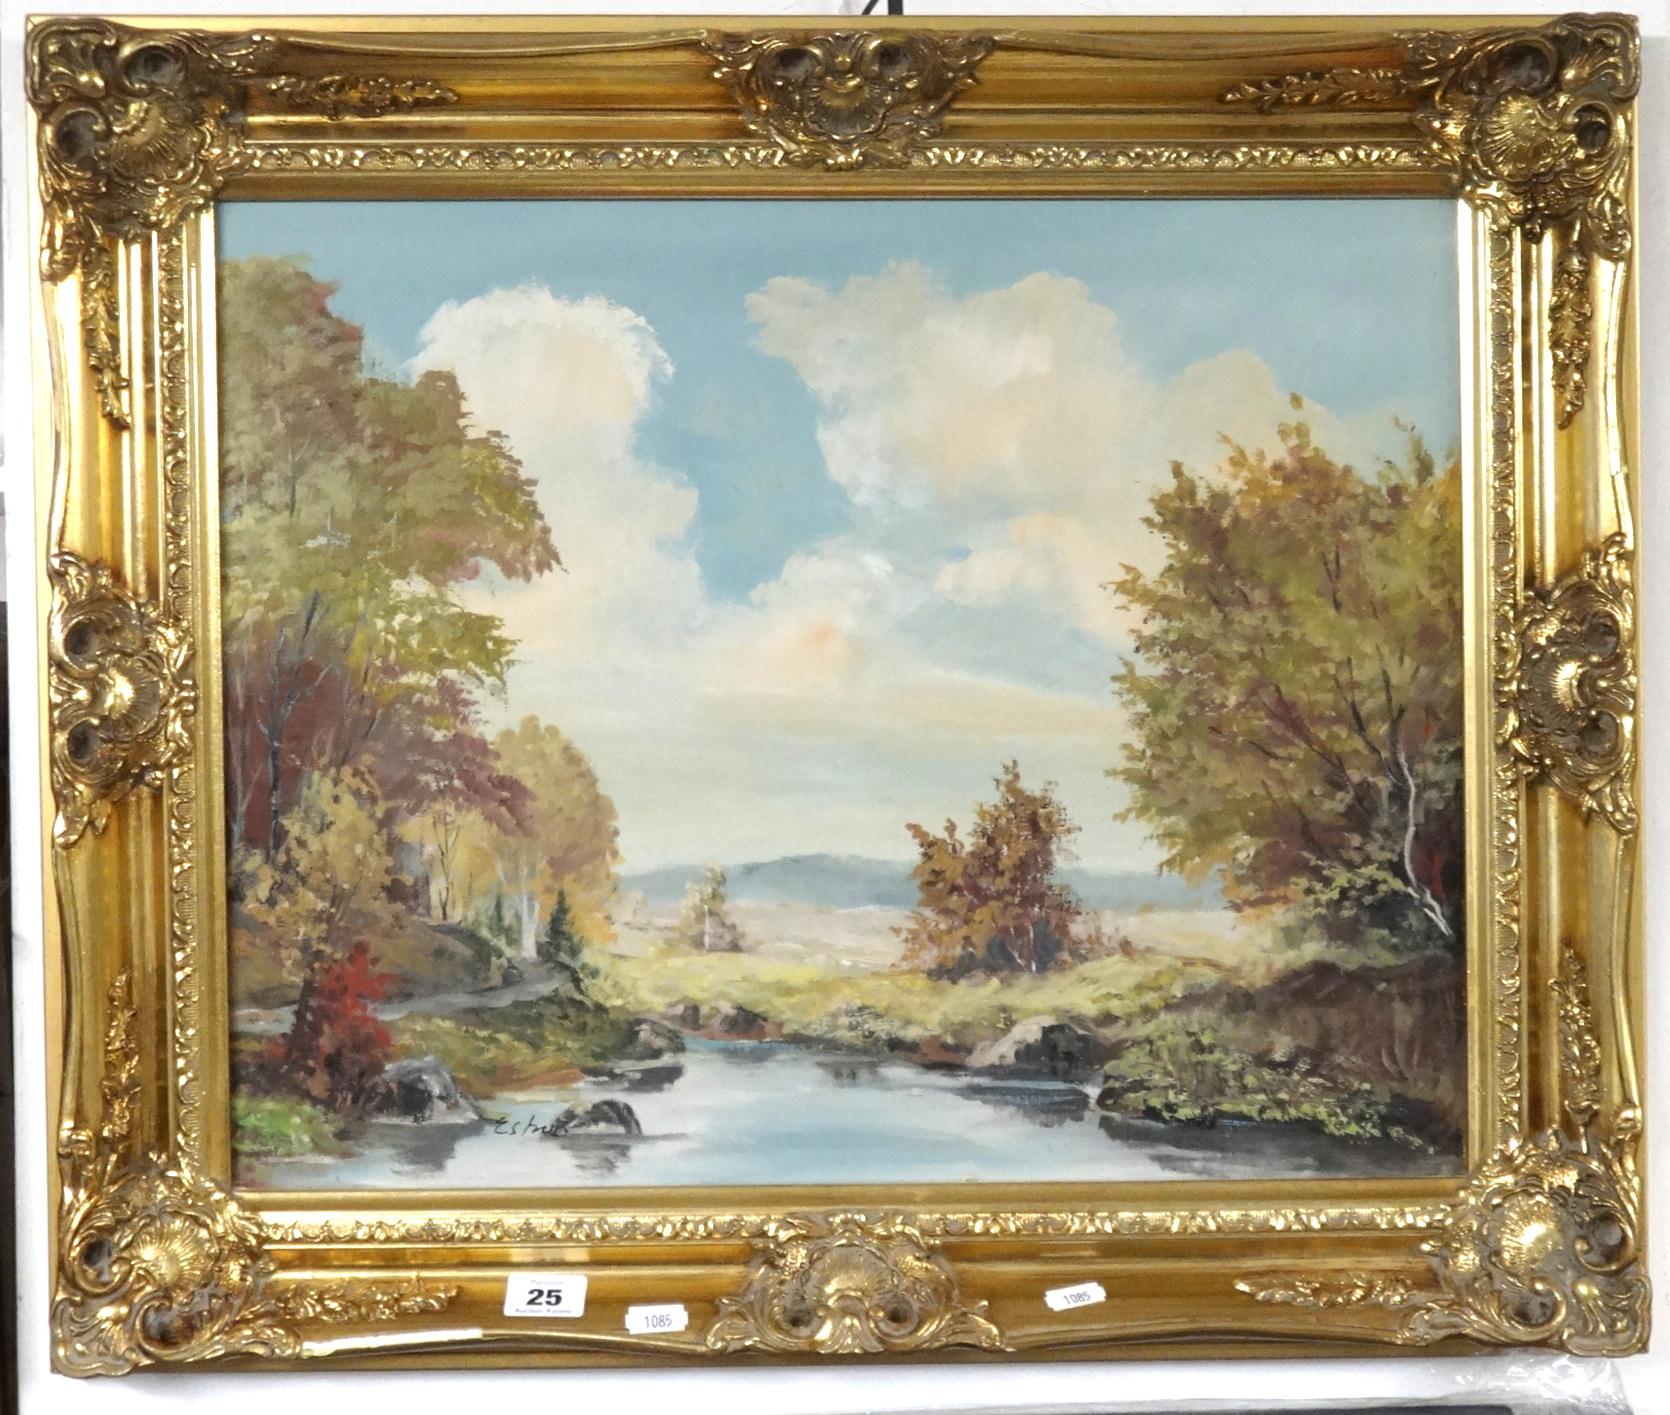 Lot 025 - A signed 20th century oil on canvas, river landscape in ornate gilt frame, 40cm x 52cm.